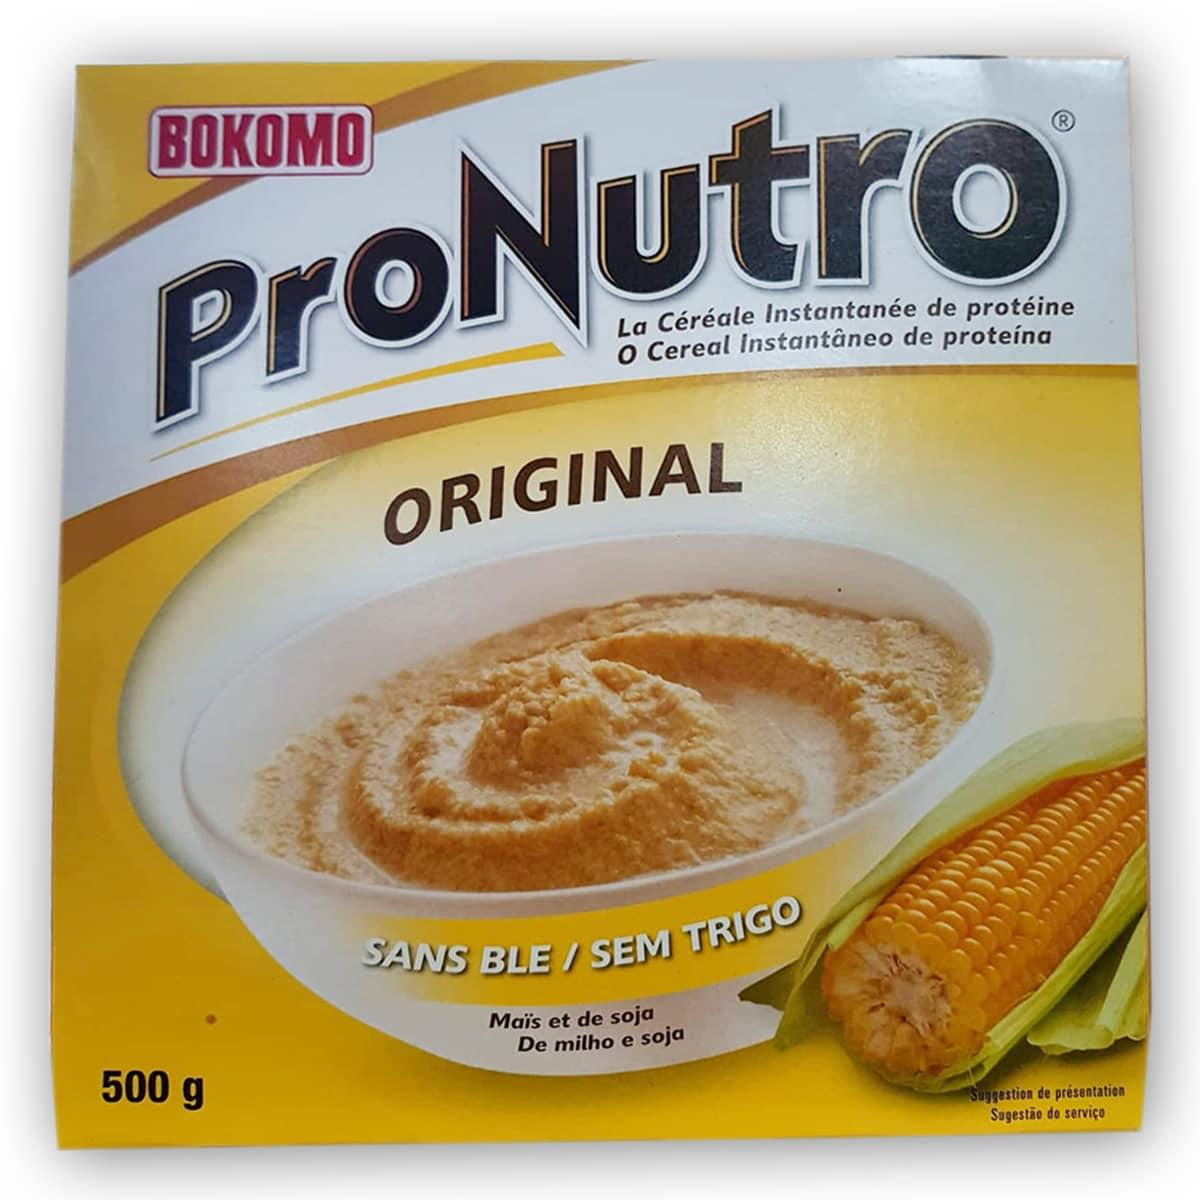 Buy Bokomo Pronutro Original (Wheat-free) - 500 gm